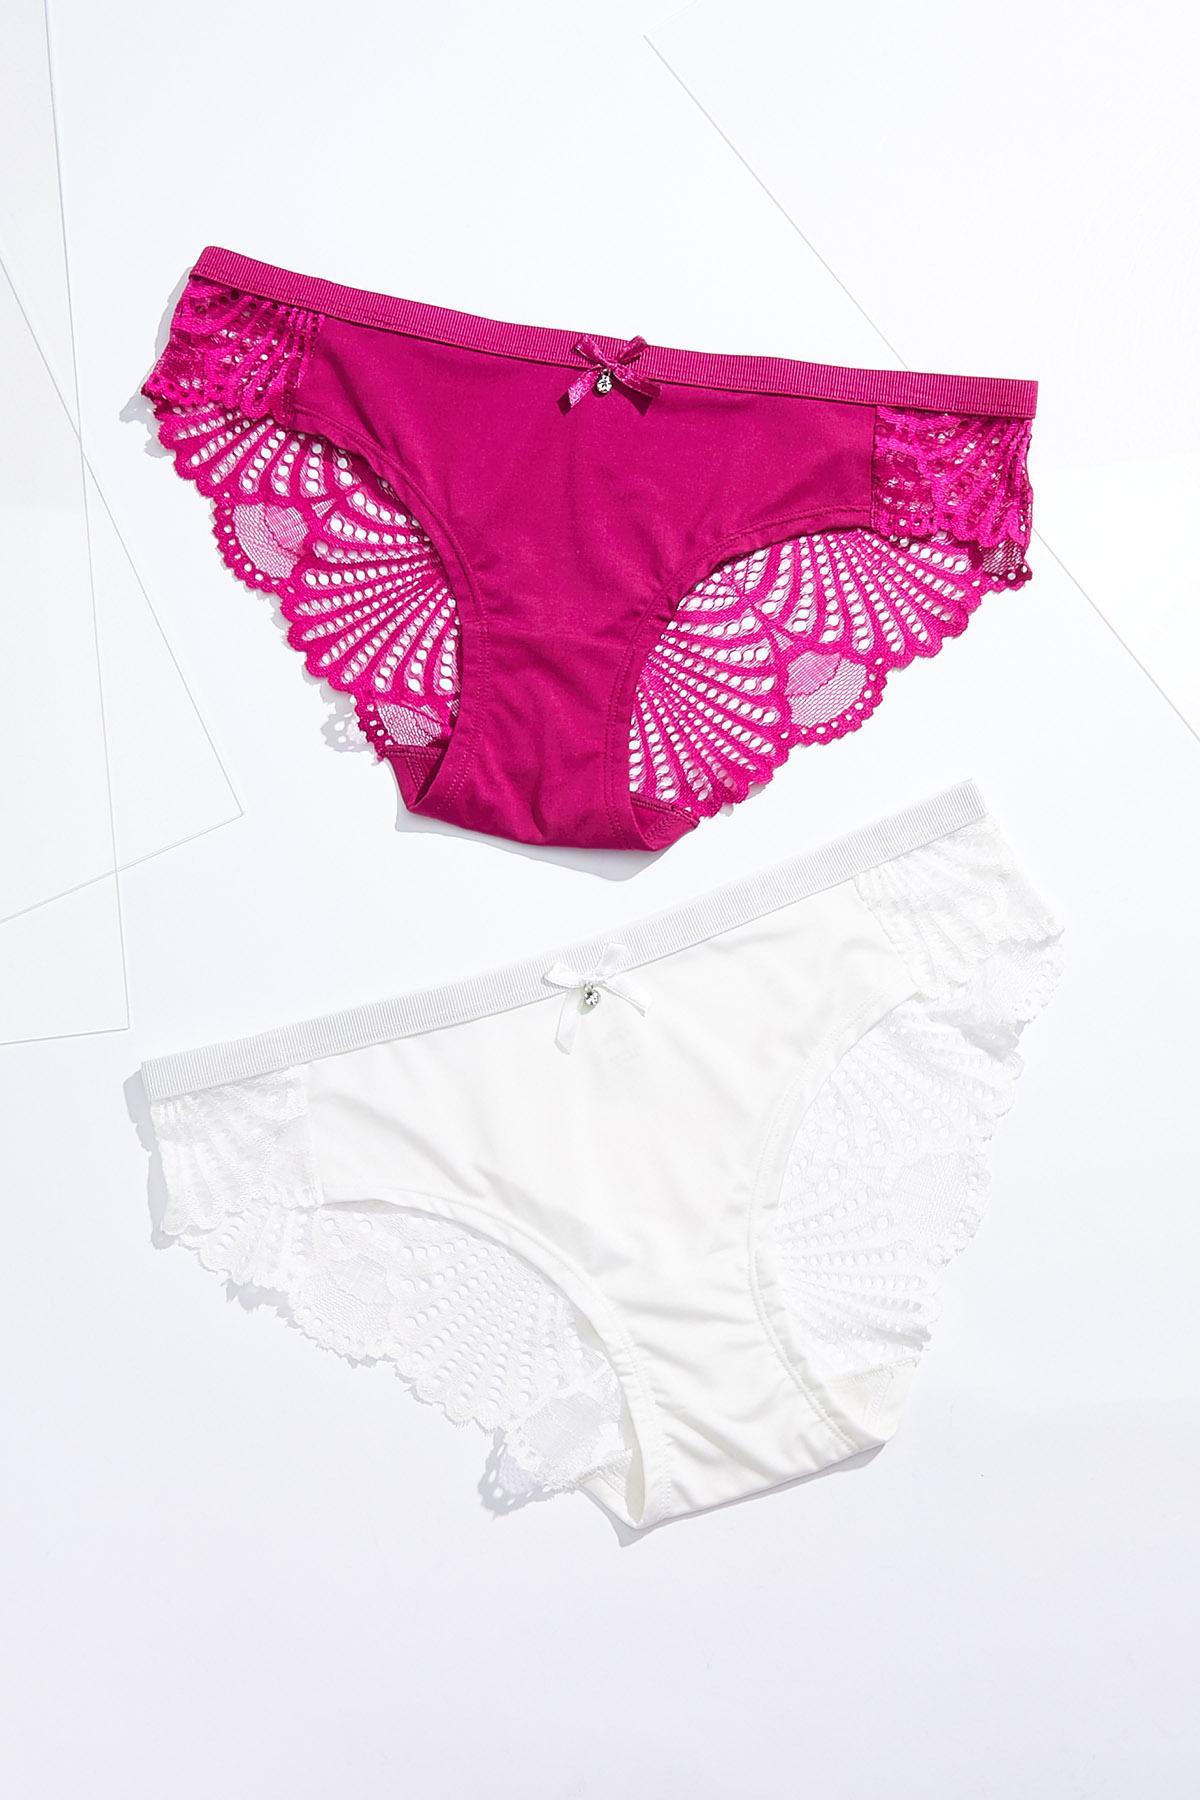 Plus Size Lace Trim Hipster Panty Set